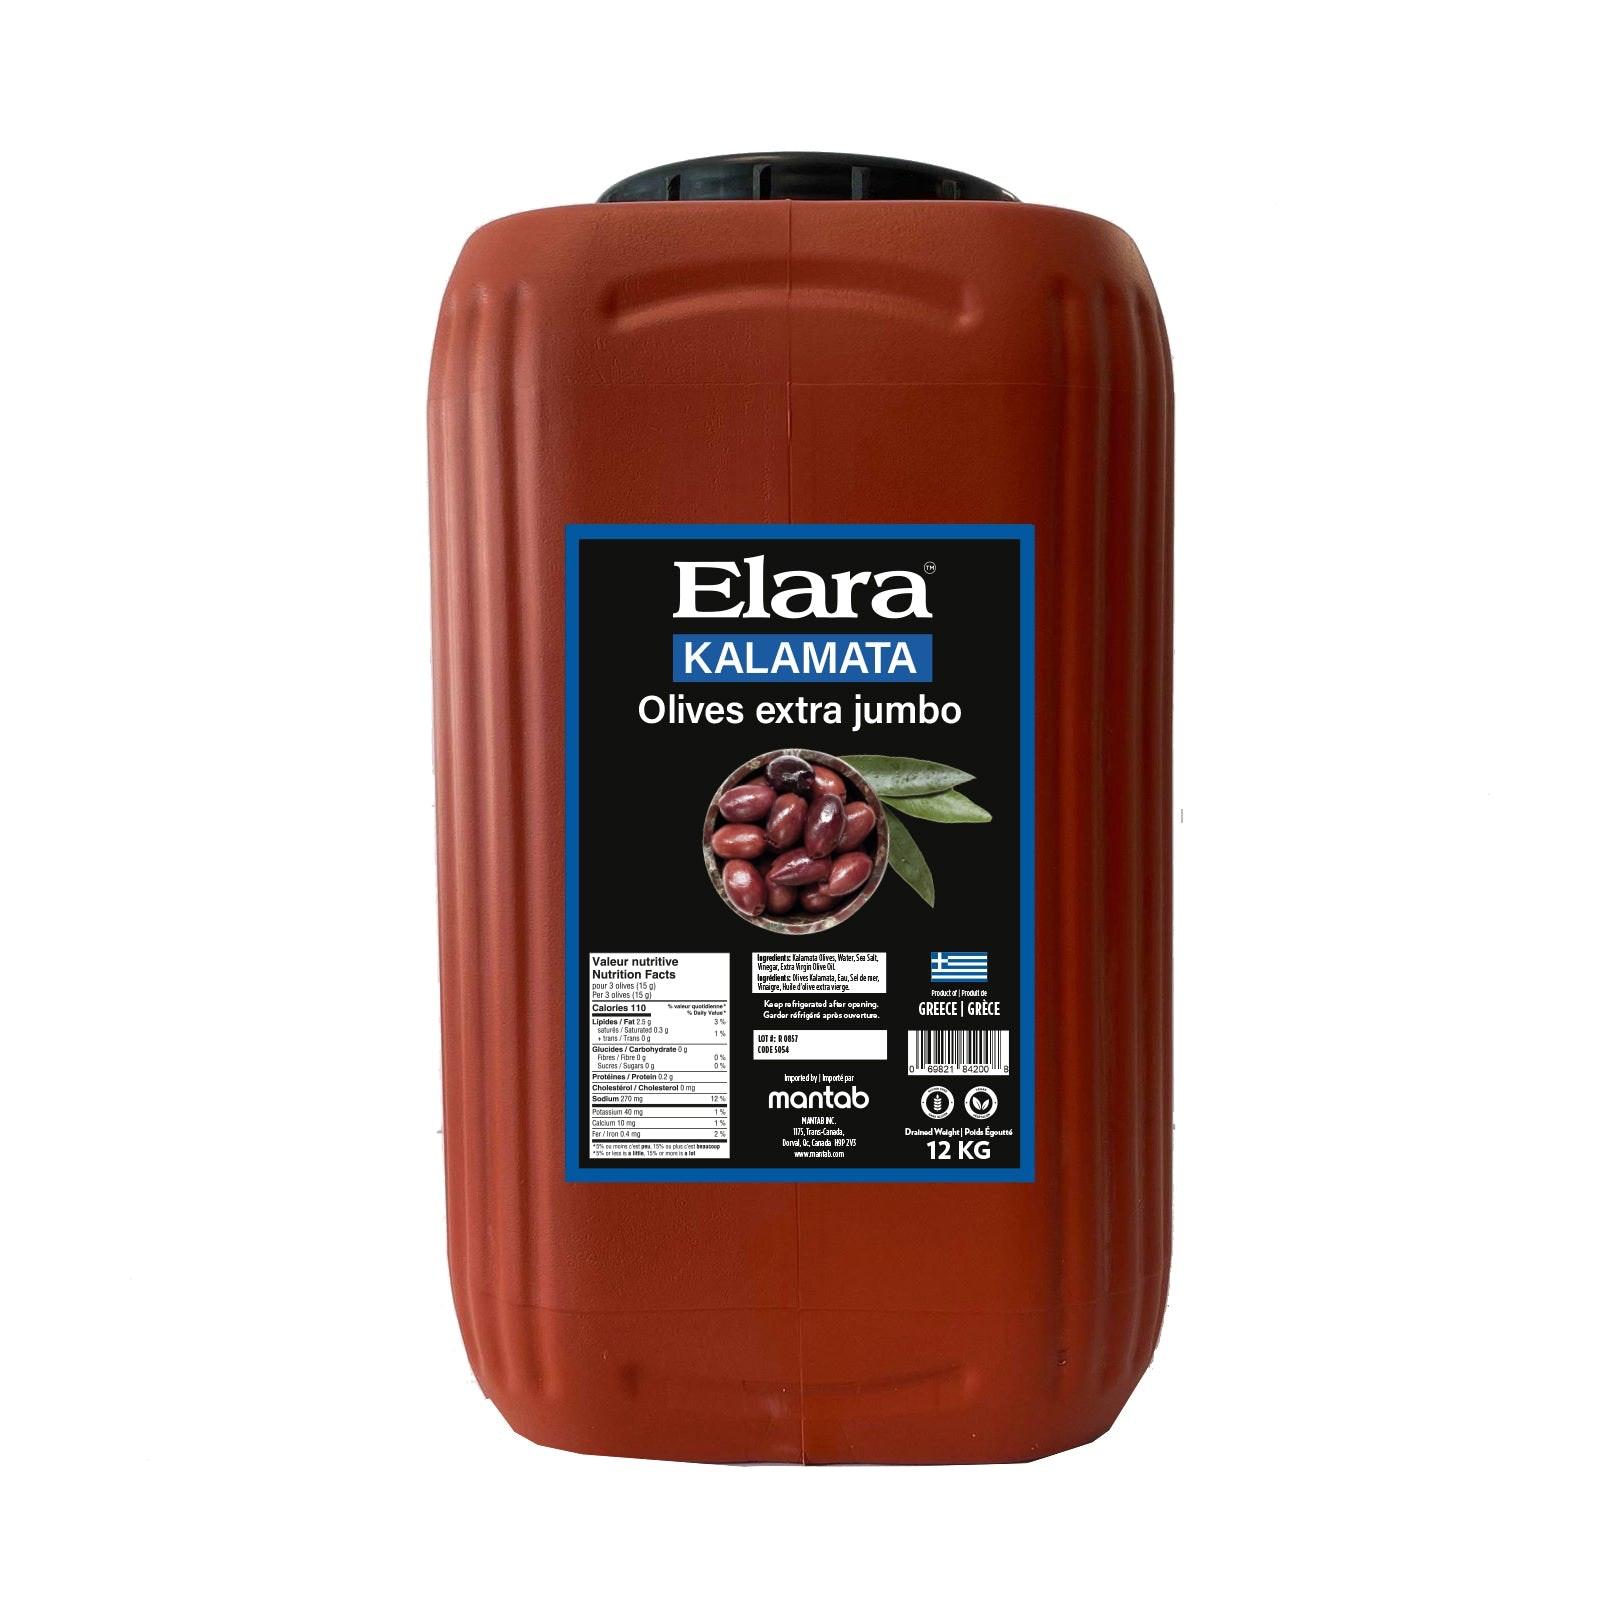 ELARA Kalamata olives Extra Jumbo